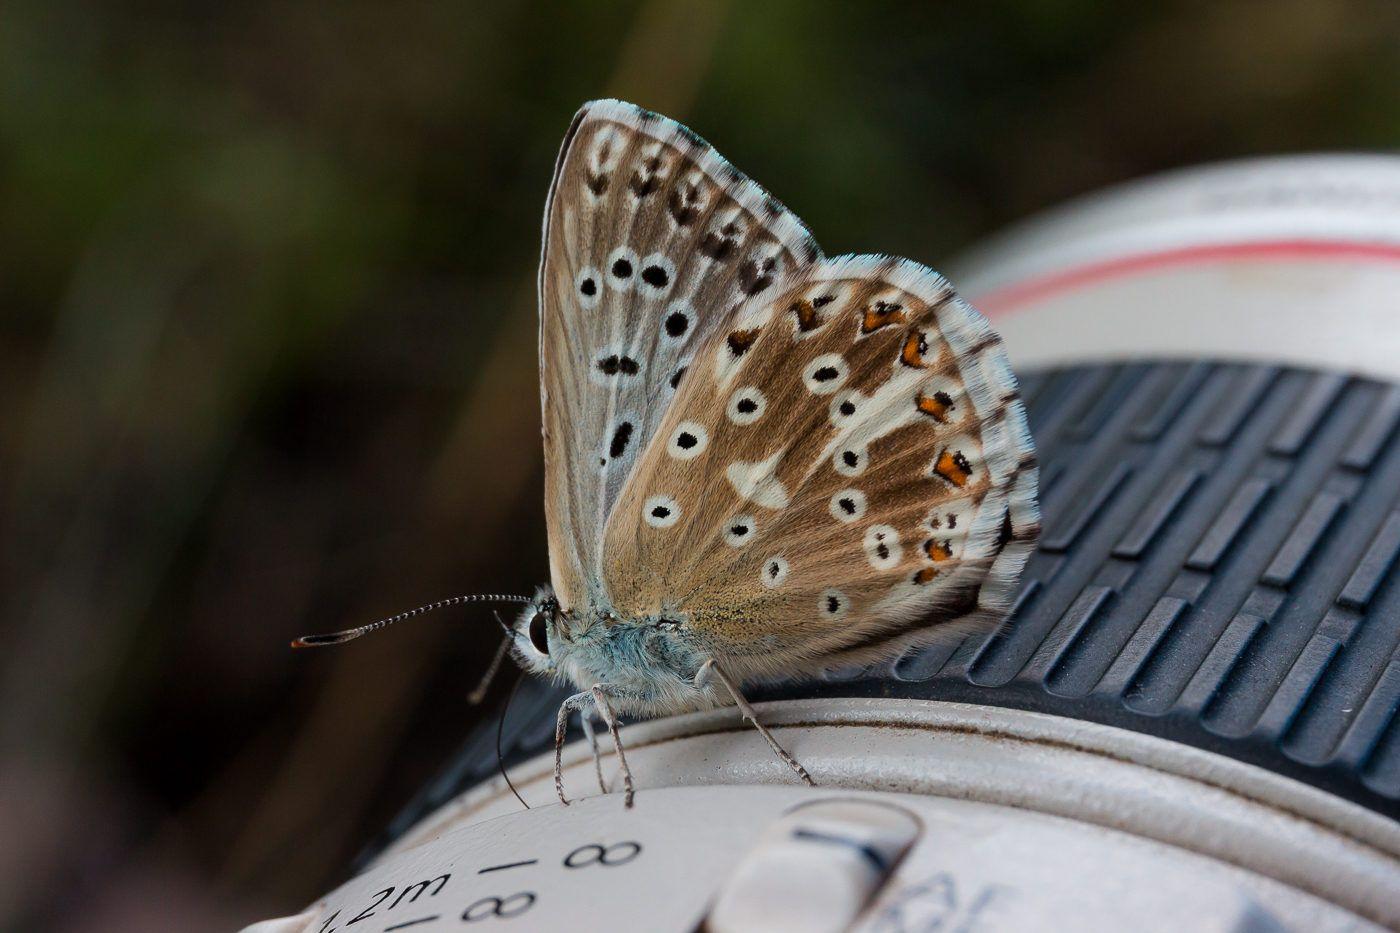 wildlife, insects,butterfly, насекомые, бабочка, голубянка, икар, common blue, Юденков Алексей